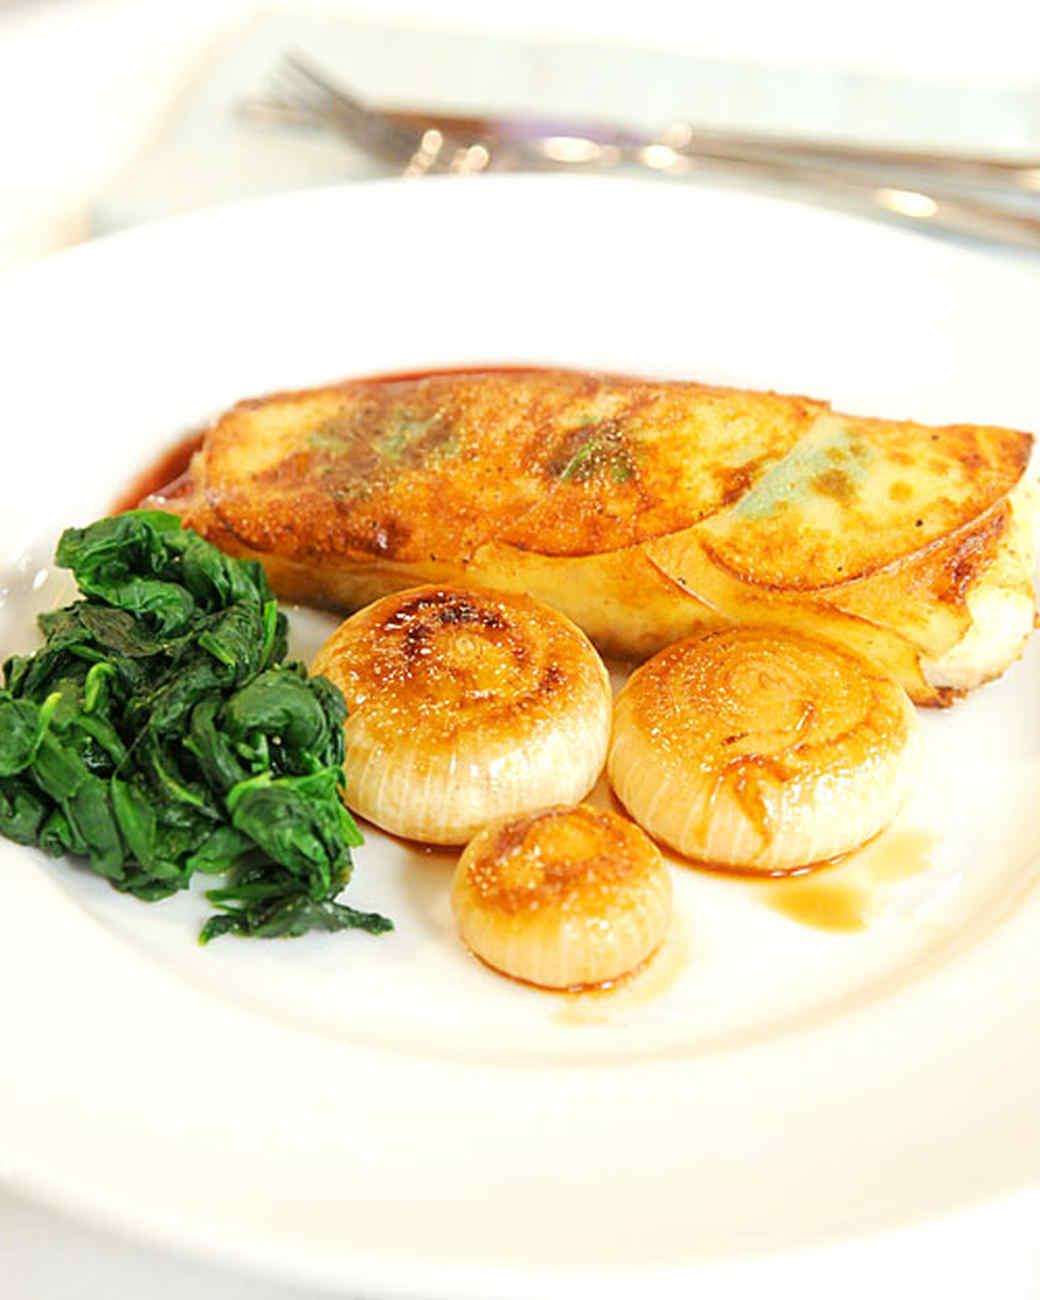 Balsamic-Glazed Cipollini Onions